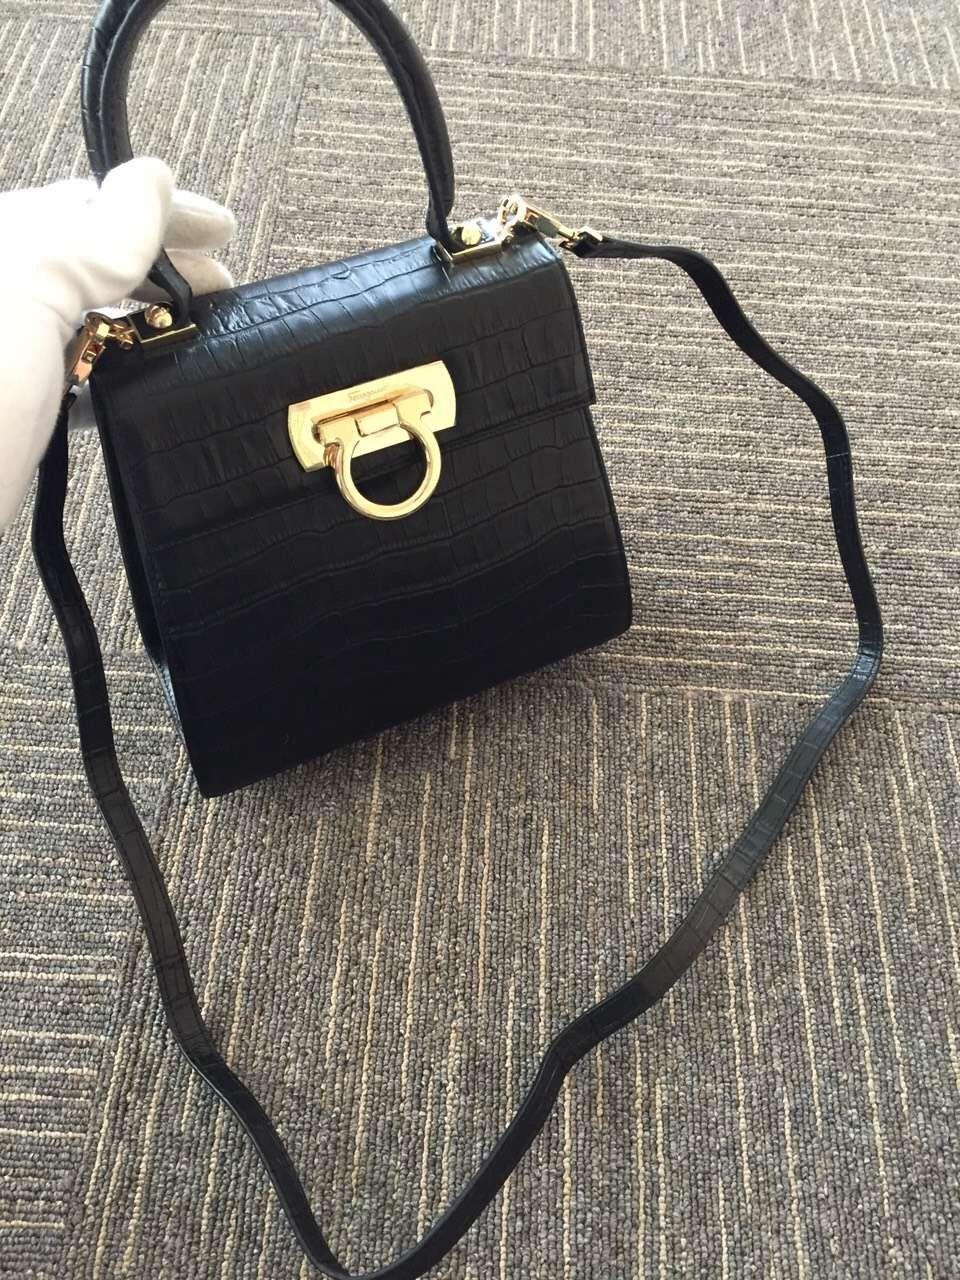 93c4c62a9c Ferragamo Small Clafskin Crocodile Pattern Katia Satchel Top Handle Bag  Black